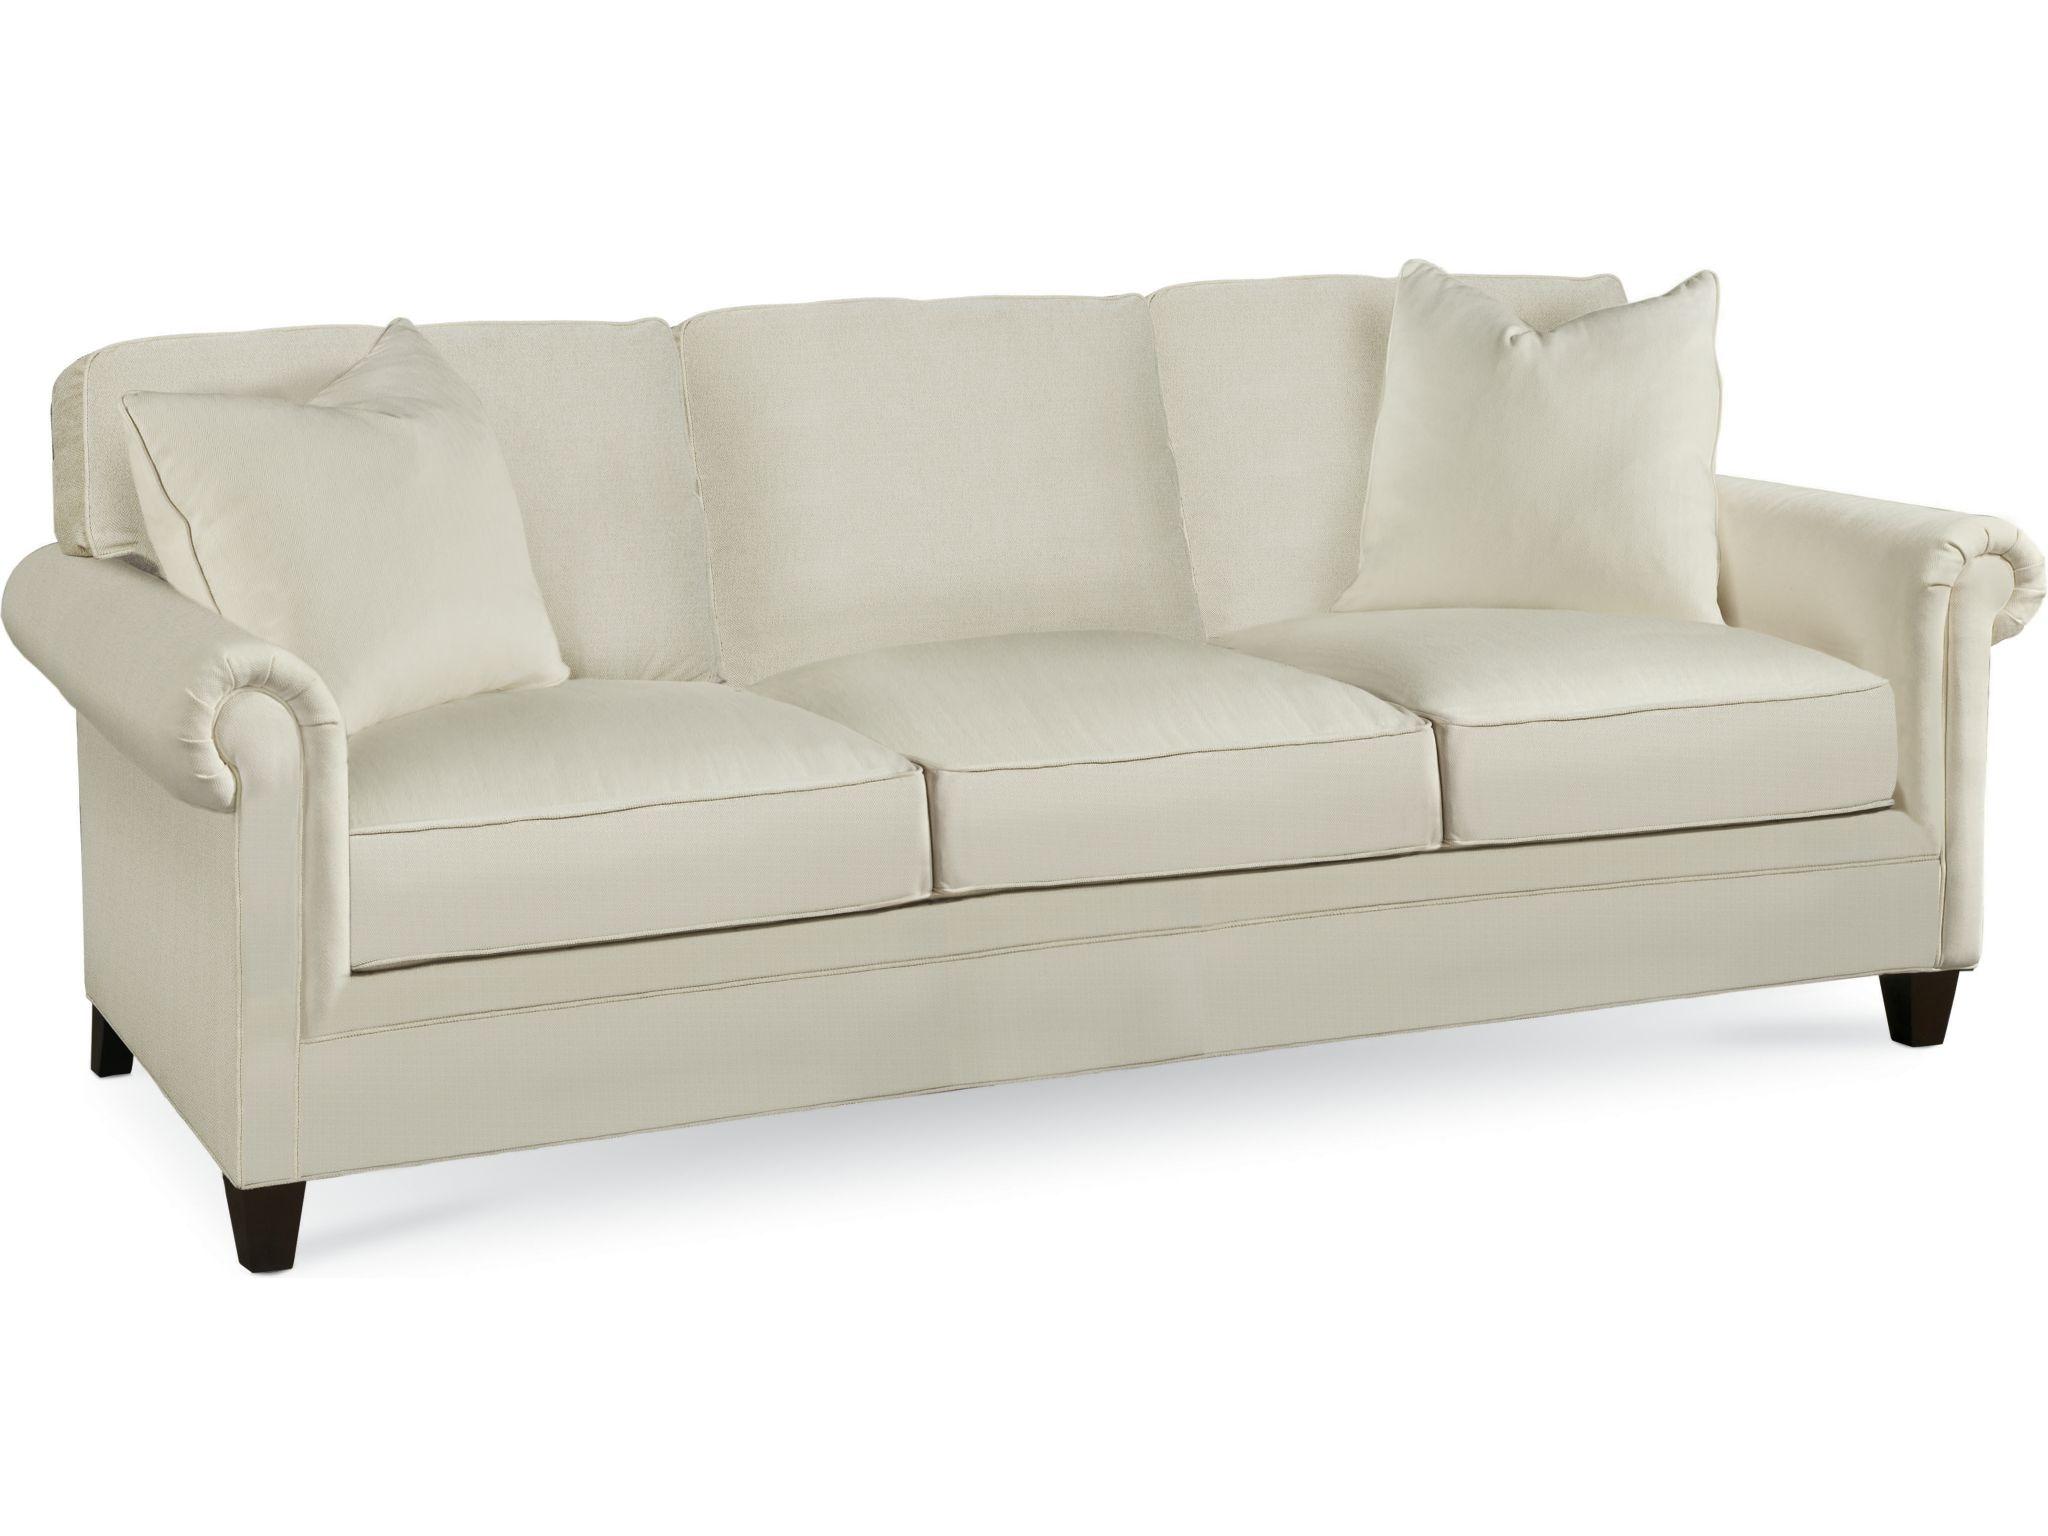 mercer large 3 seat sofa thv180111 at walter e smithe furniture and design